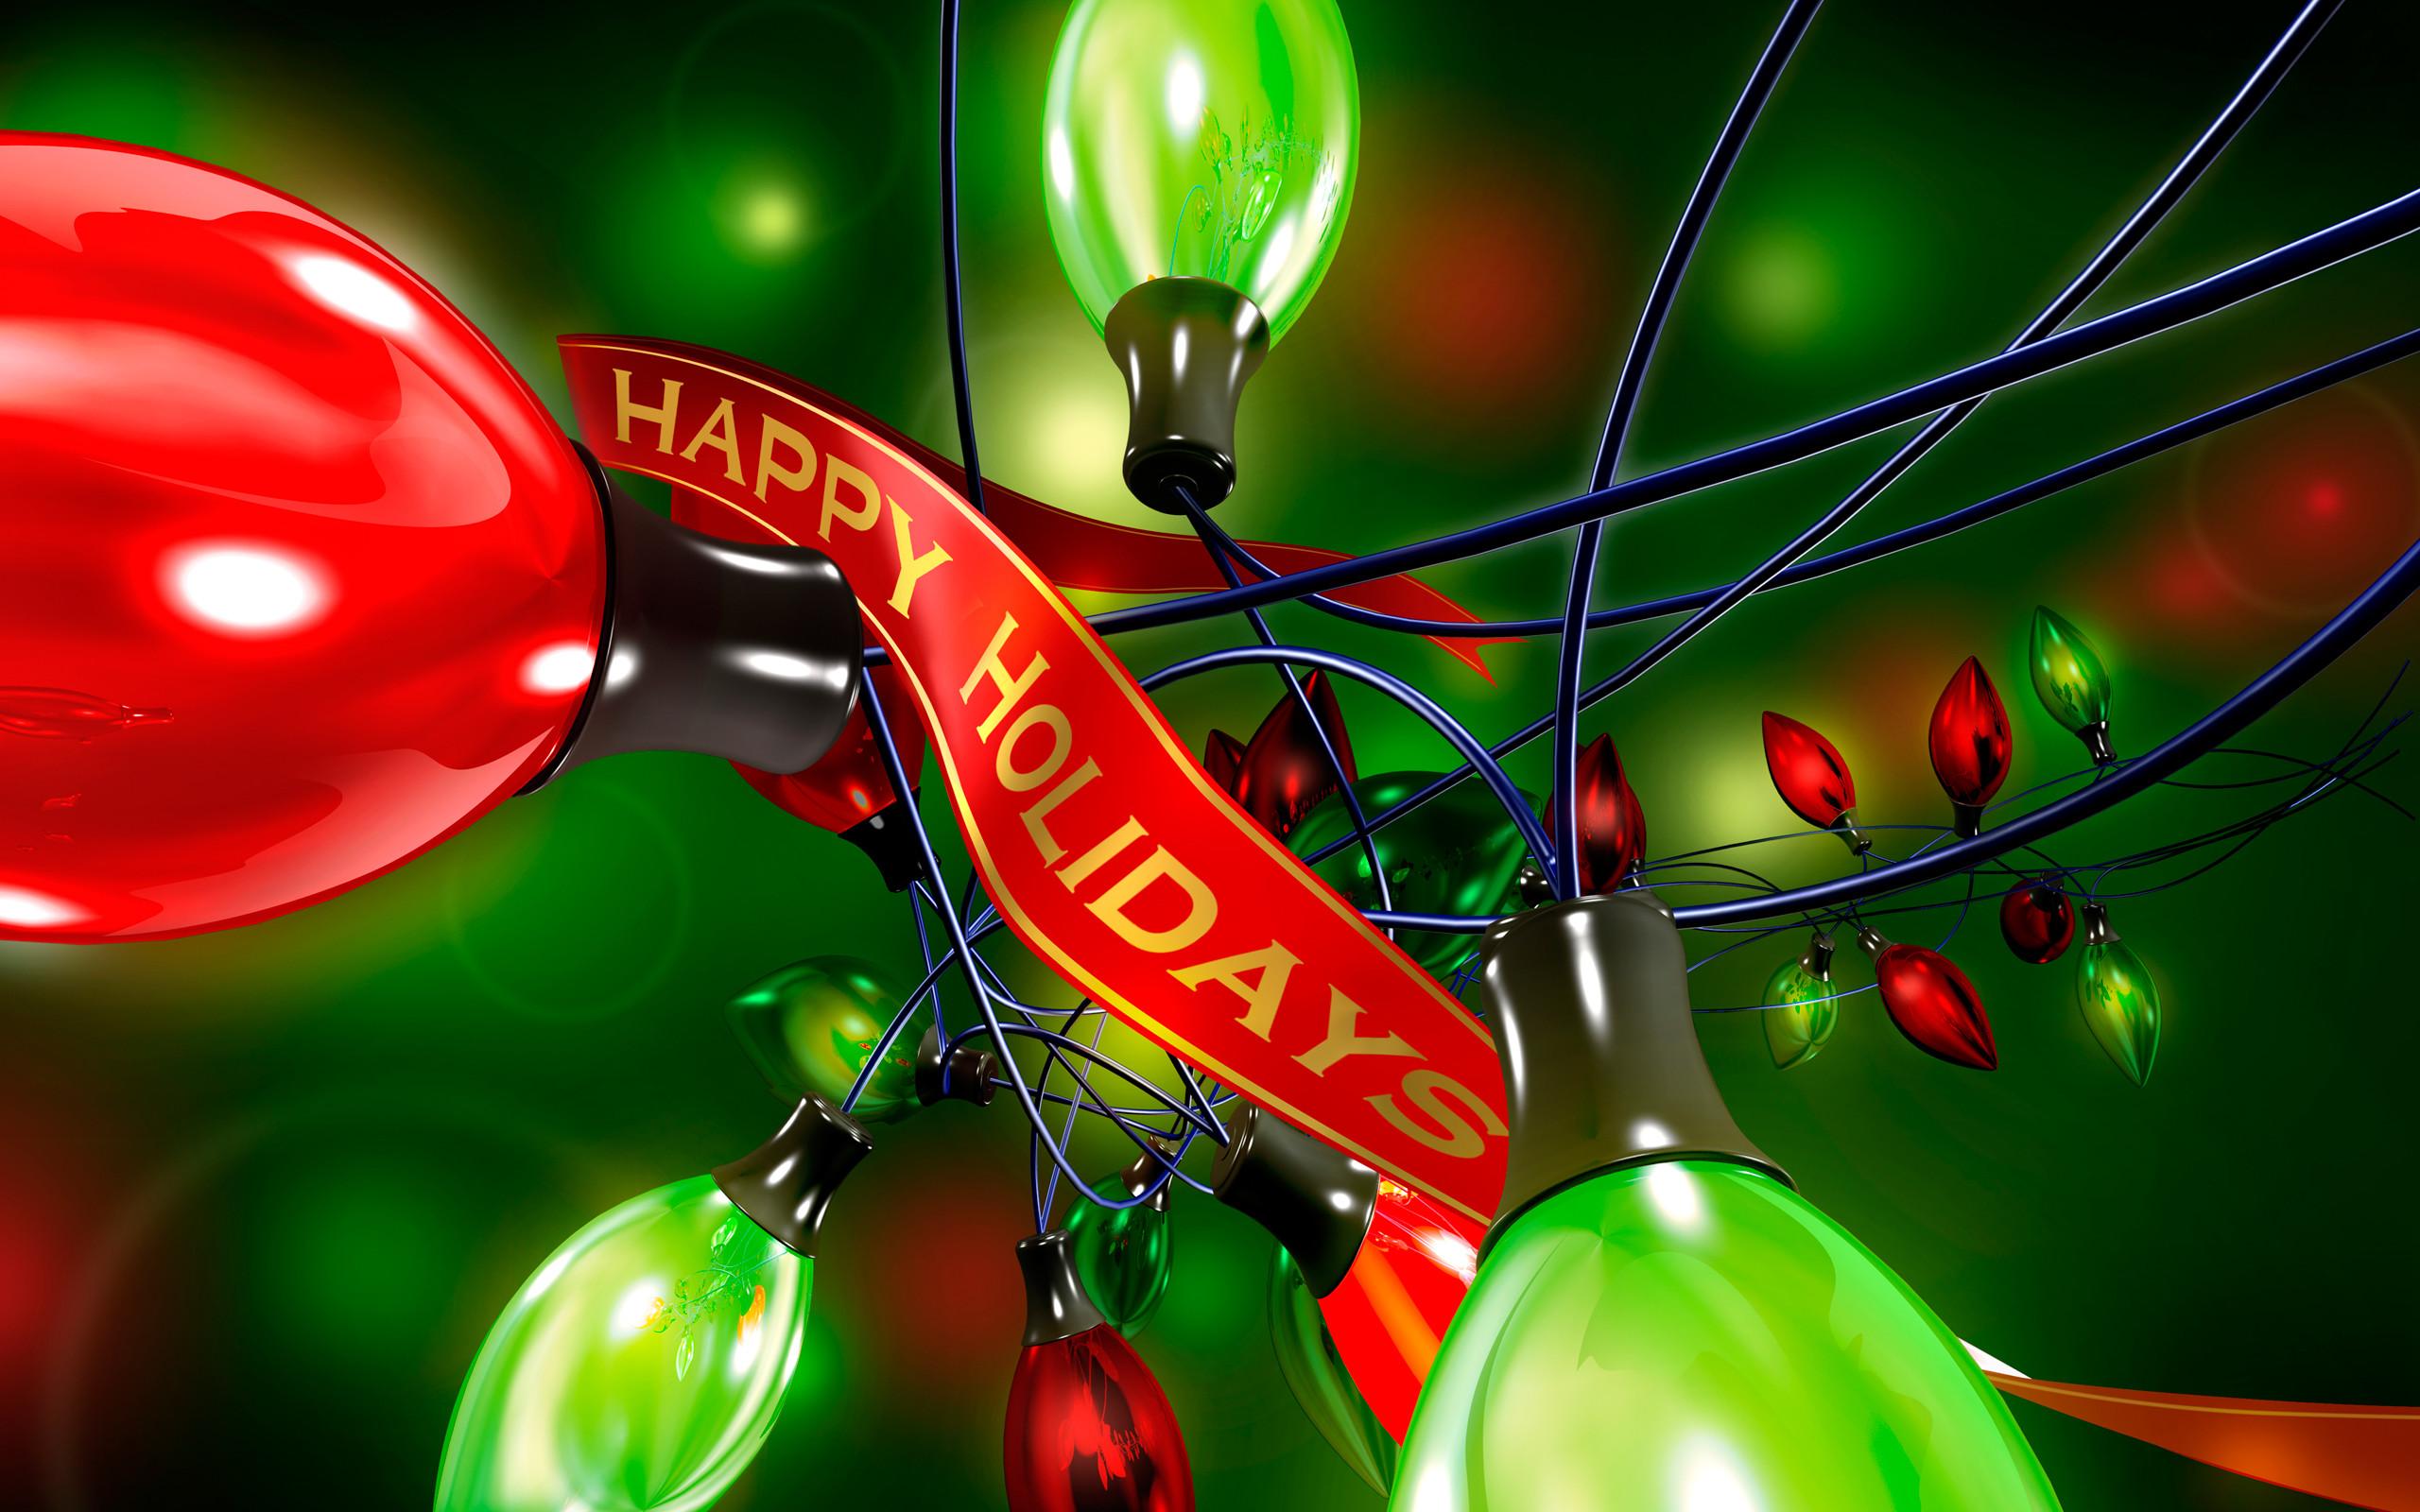 Birthday Best 3D Happy Birthday Wishes Wallpaper – HD Wallpapers Desktop  Wallpapers 3D Natural